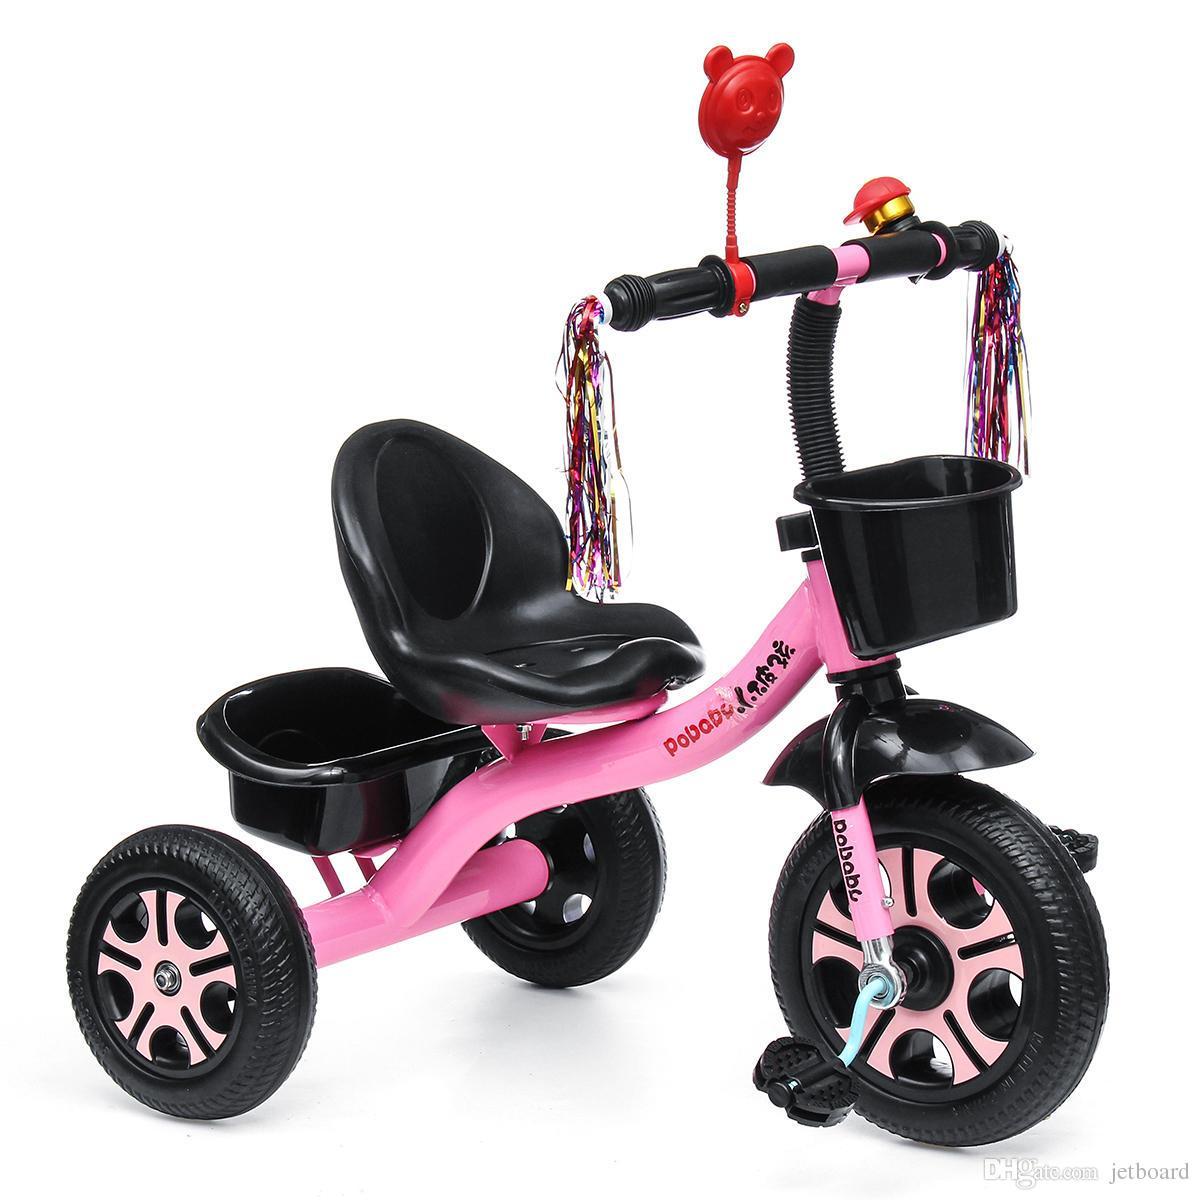 5971279748c BIKIGHT 3 Wheels Kids Ride On Tricycle Bike Children Ride Toddler Balance  Baby Mini Bike Safety Bike Stand Marin Bikes From Jetboard, $25.13|  DHgate.Com